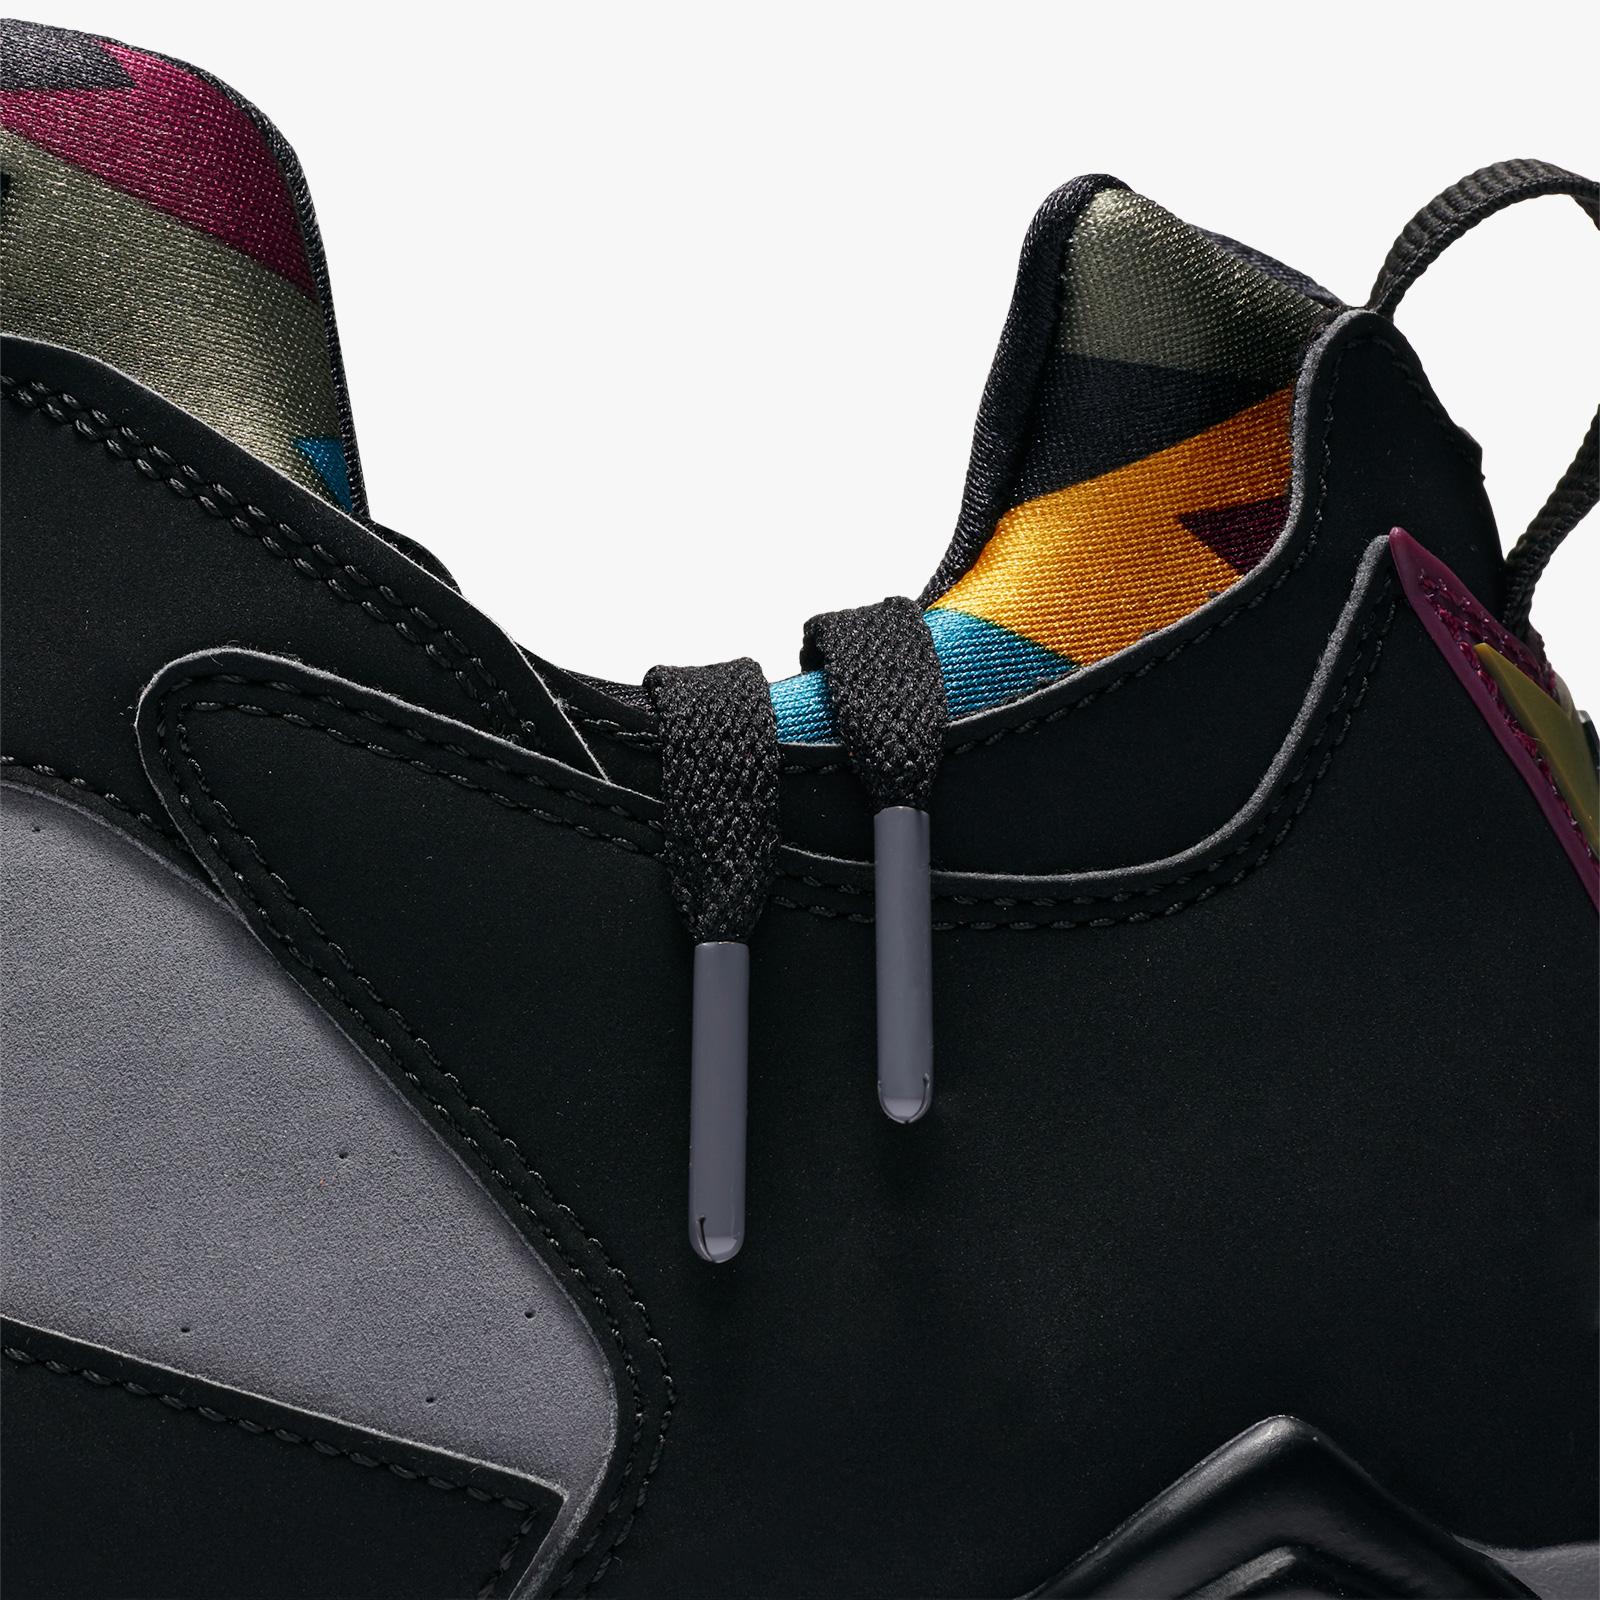 01ebfa8e376 Jordan Brand Air Jordan 7 Low NRG - Ar4422-034 - Sneakersnstuff ...